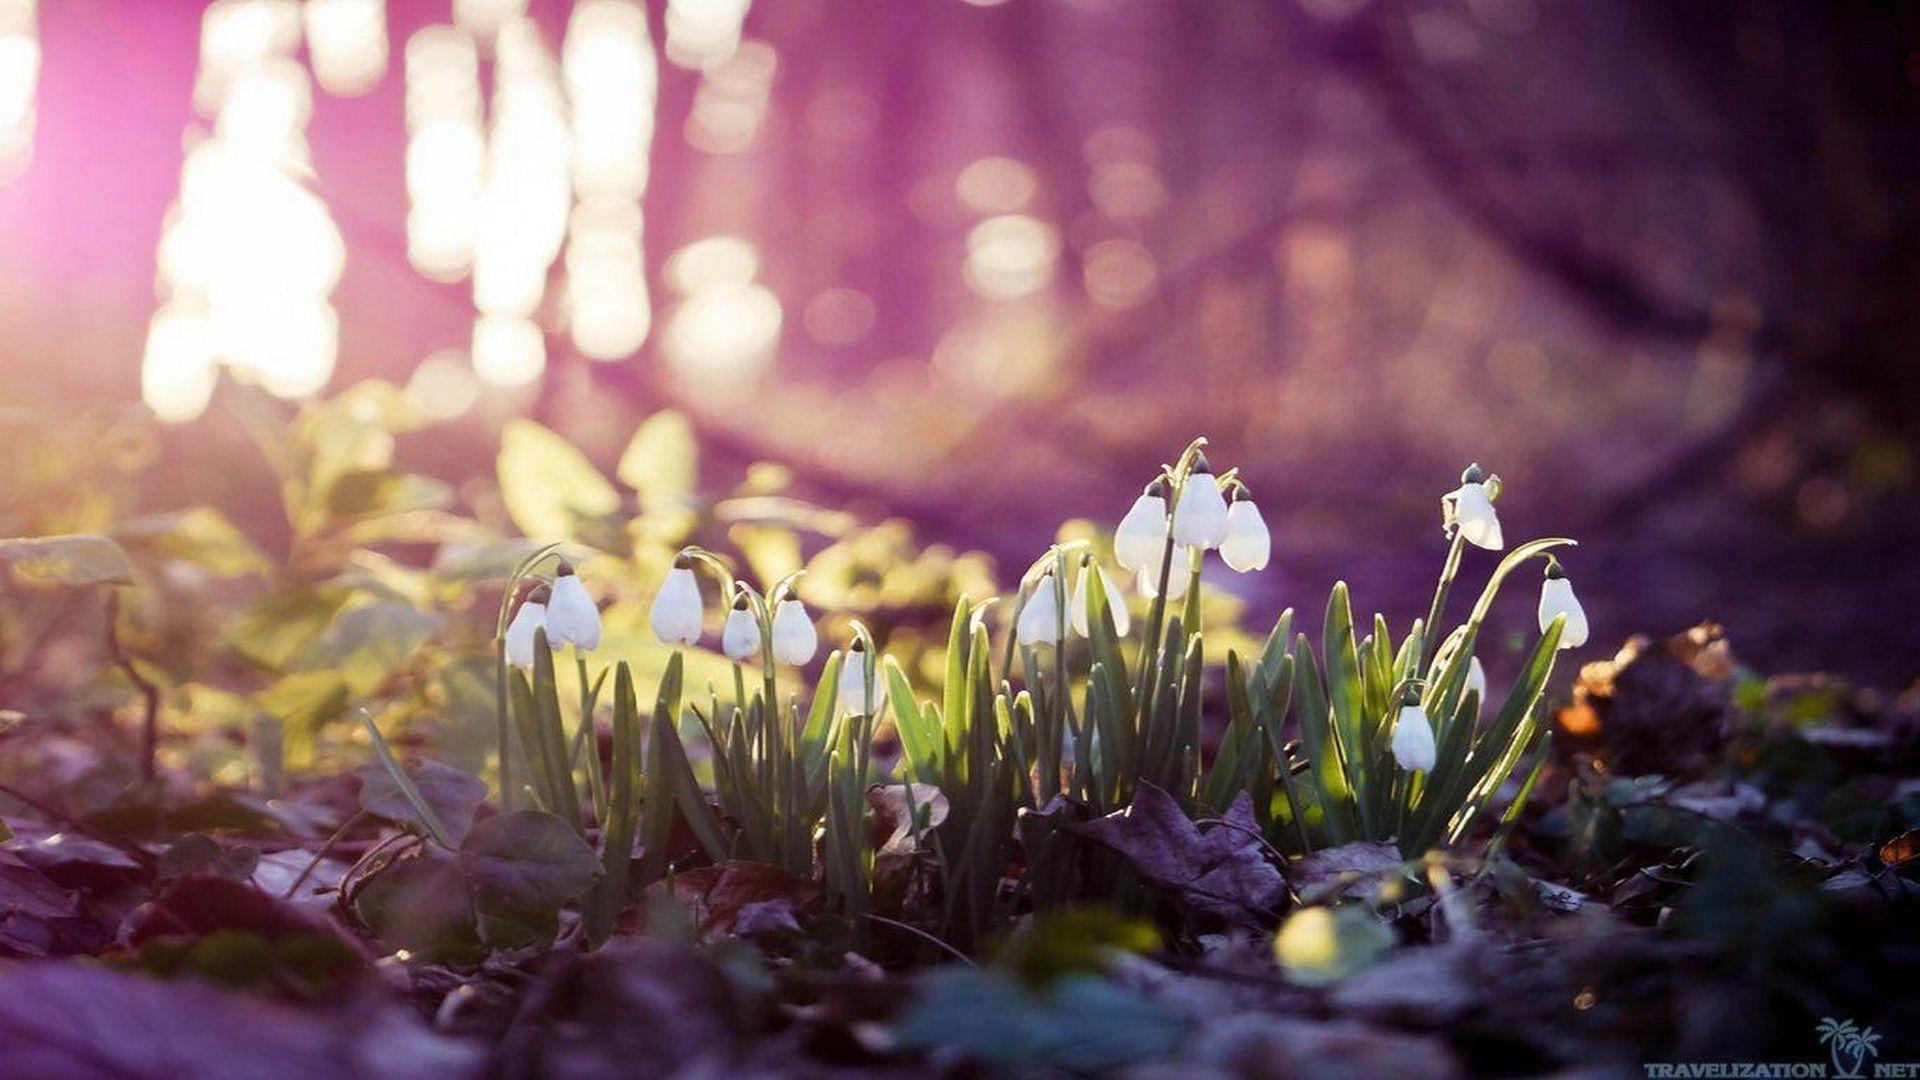 Early Spring Desktop Backgrounds Hd Best Wallpaper Hd Spring Wallpaper Hd Spring Desktop Wallpaper Spring Wallpaper